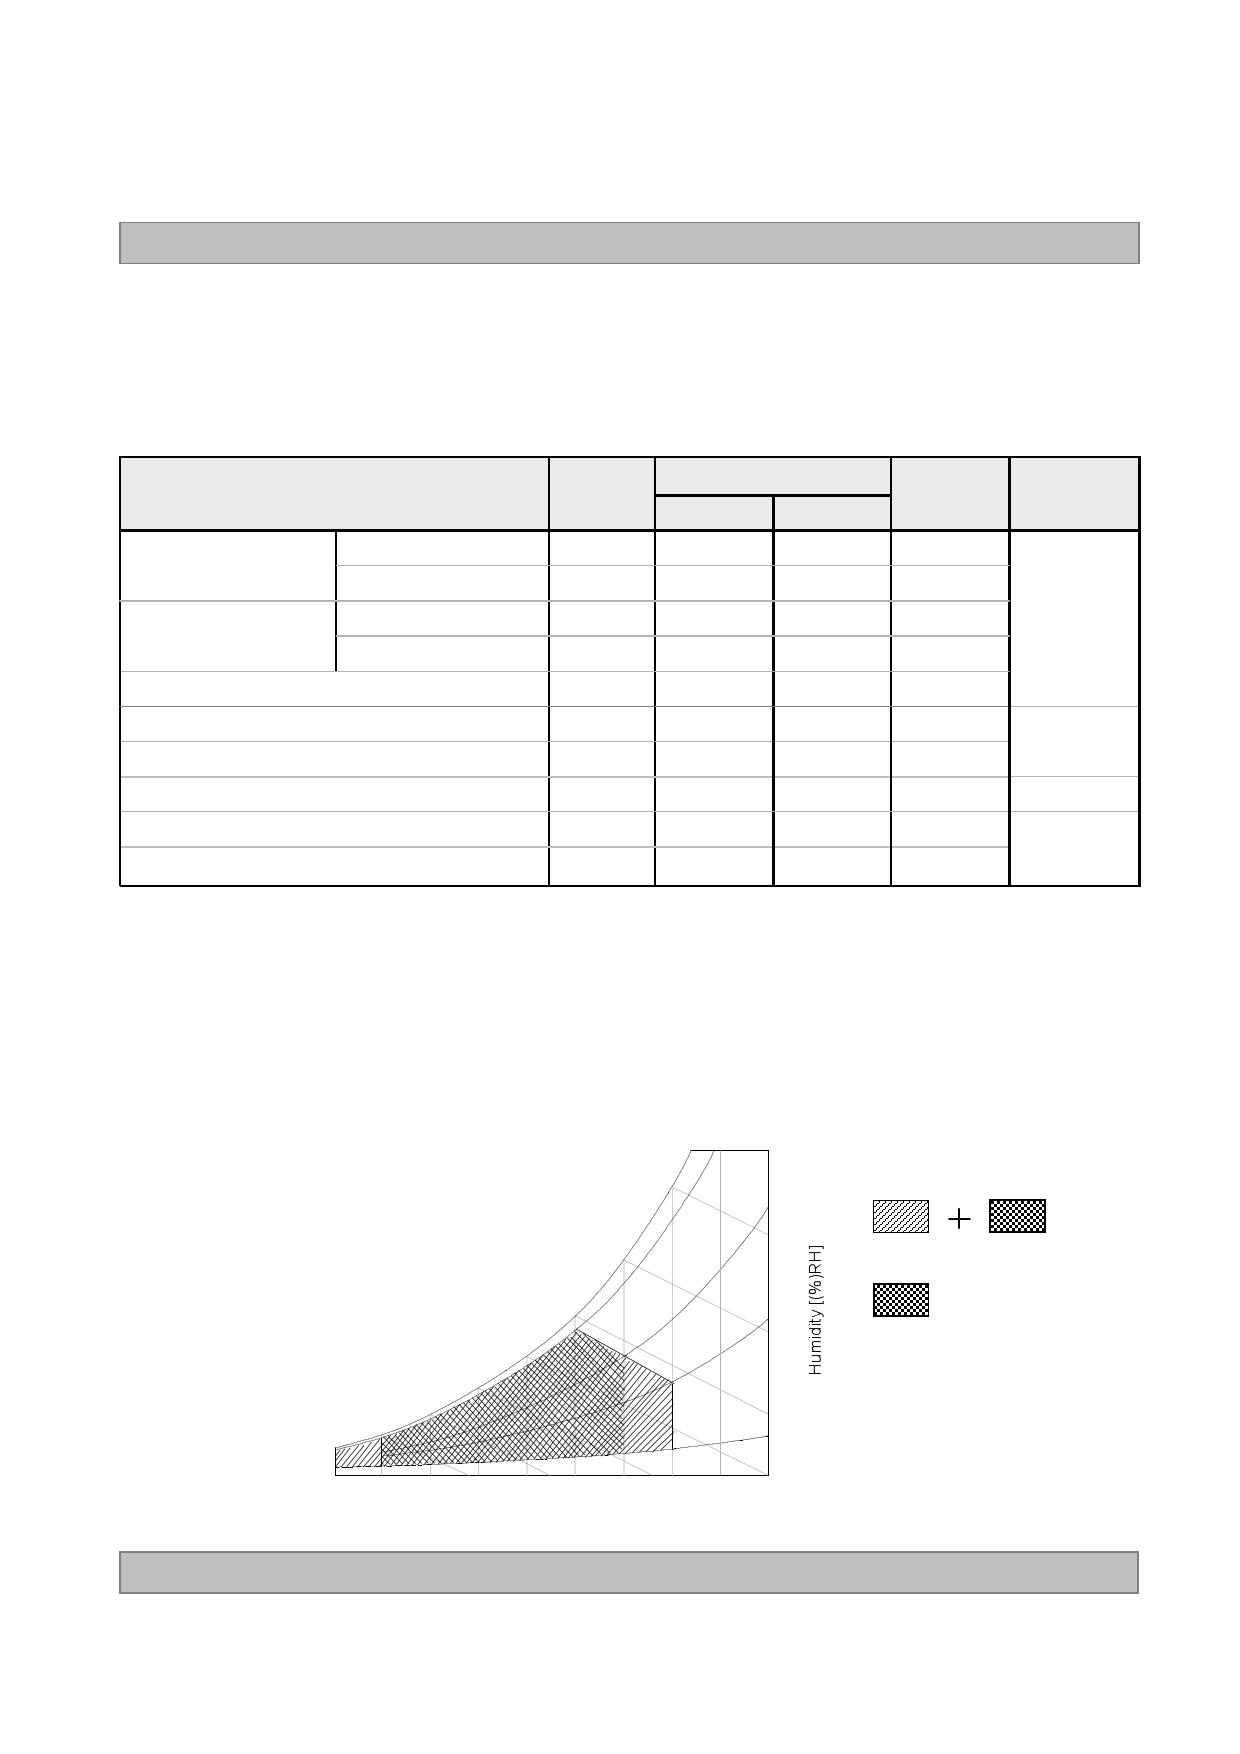 LC320WXN-SCA1 pdf